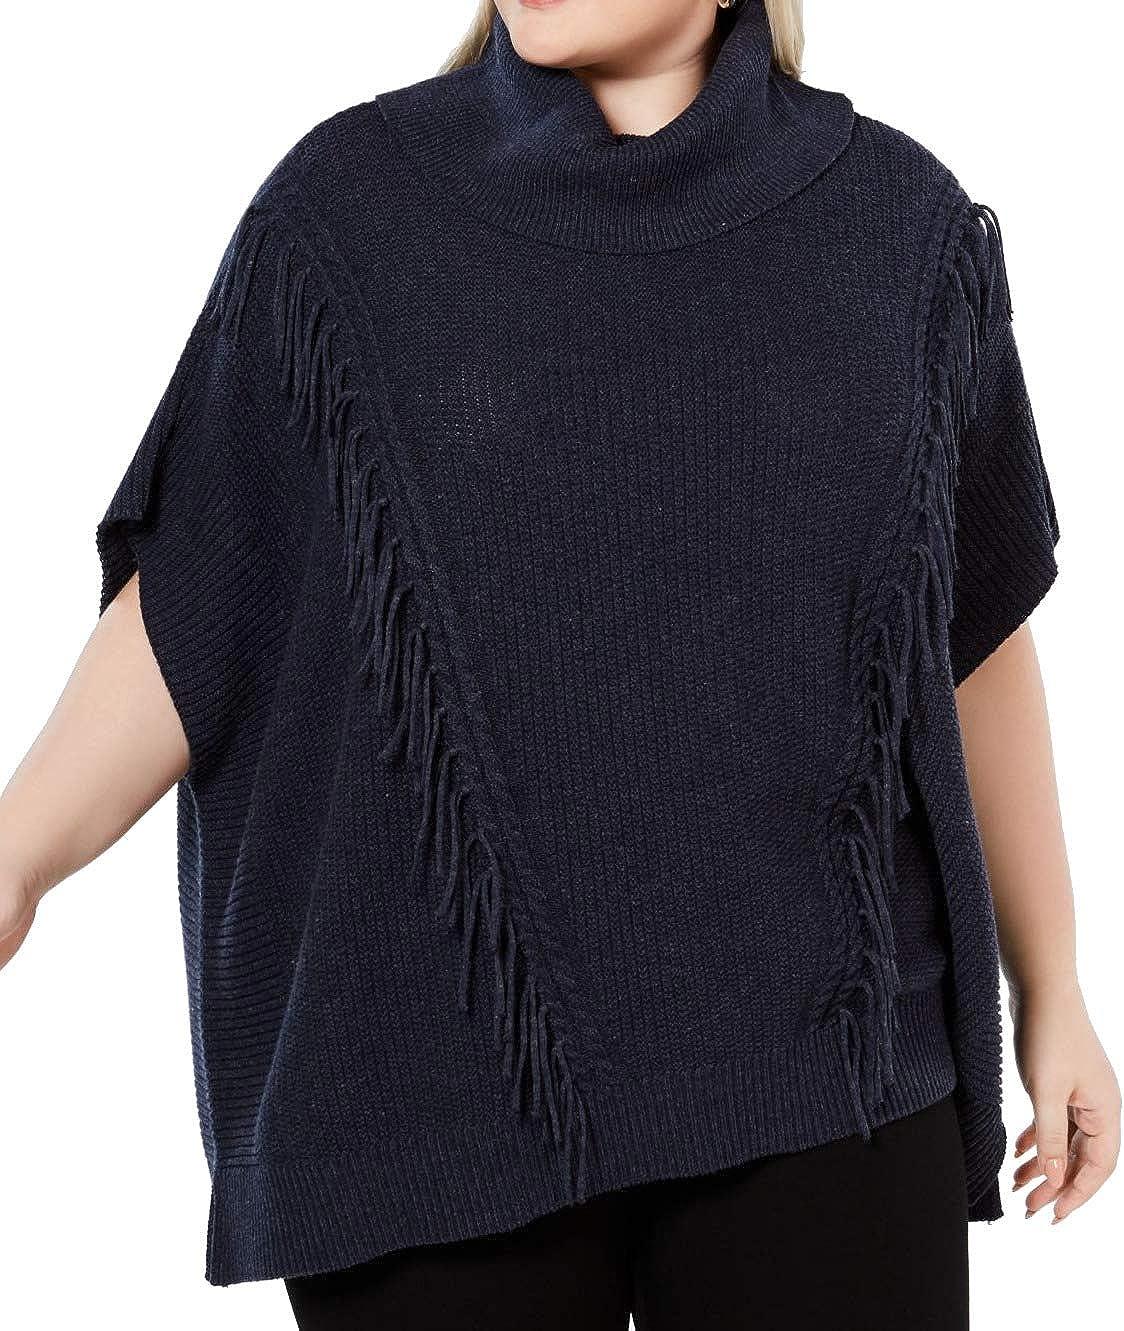 Anne Klein Women's Size Plus Fringe Turtleneck Poncho